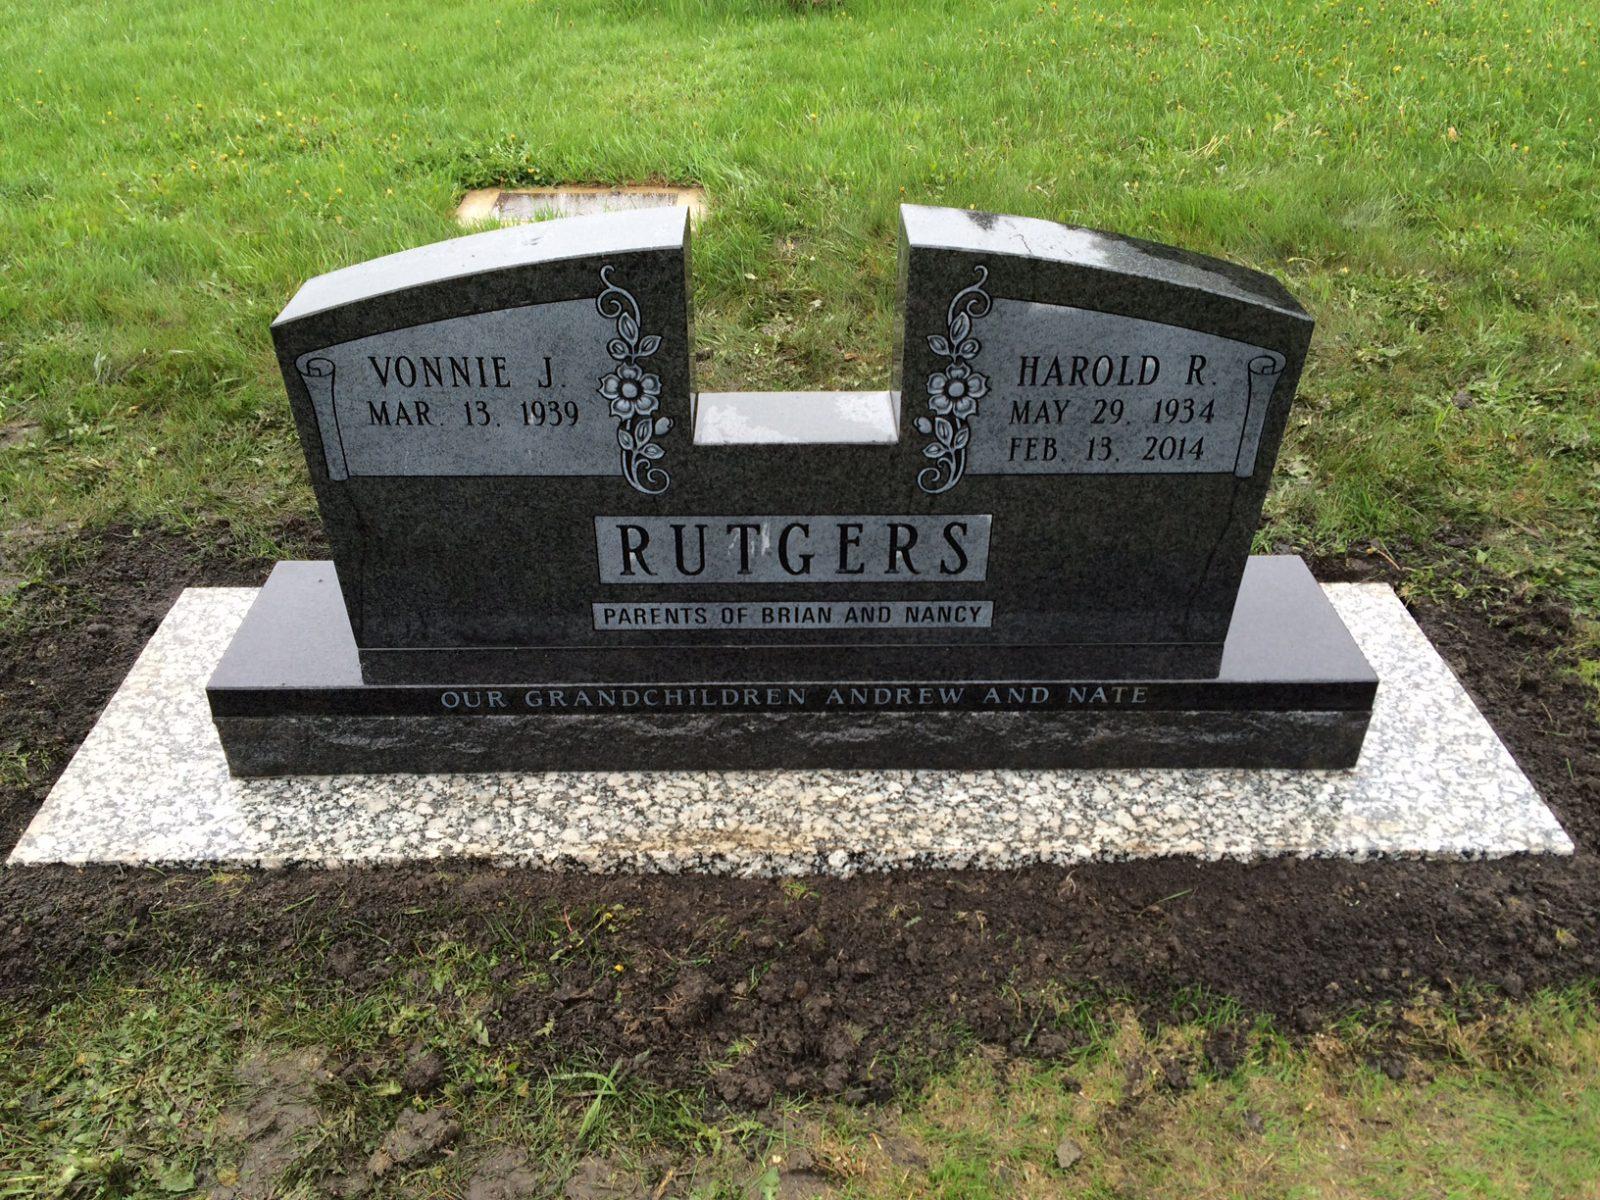 Rutgersharrold77651goed14